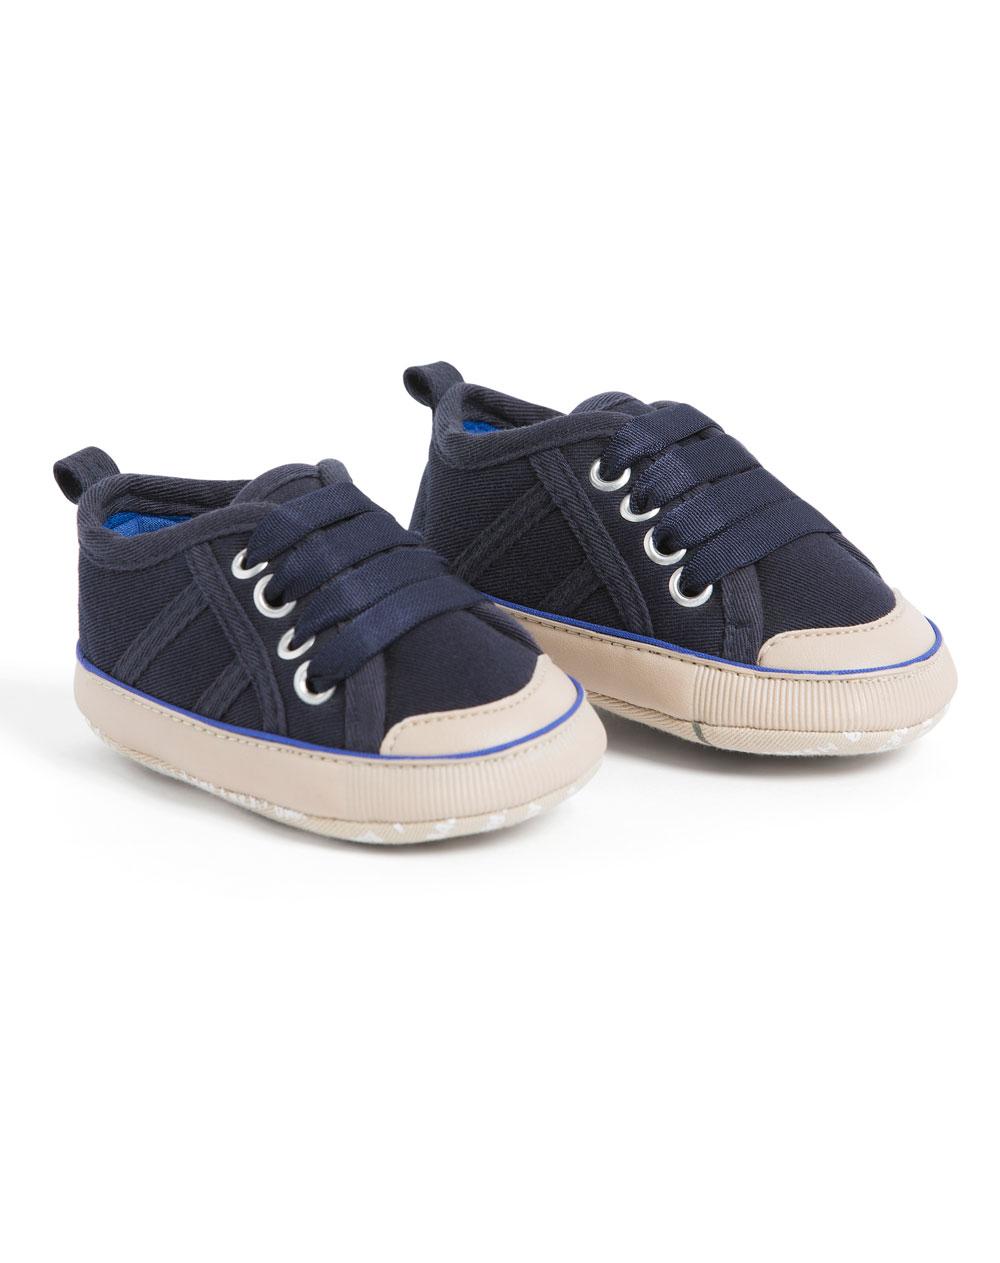 Fresh Bebé Niño Baby Zapatos Para mN8n0vw